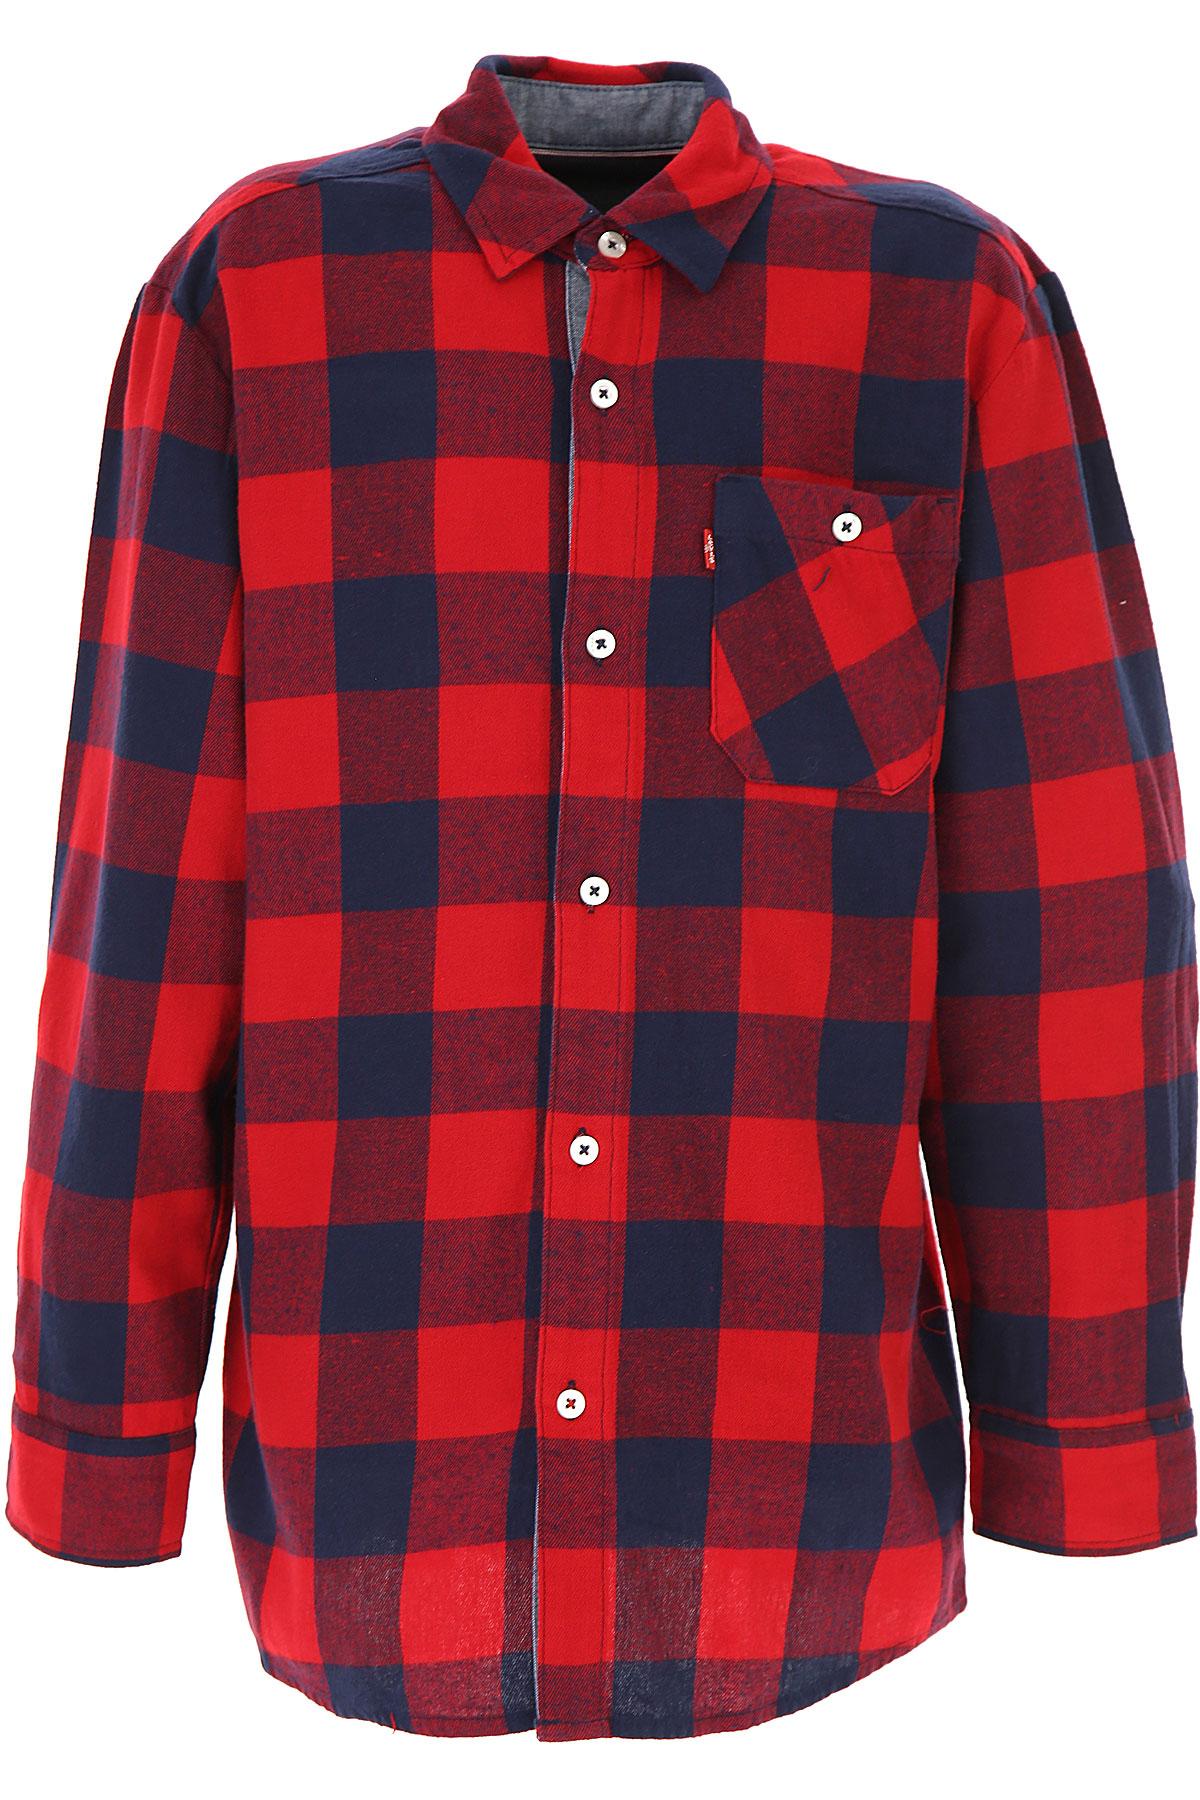 Levis Kids Shirts for Boys On Sale, Red, Cotton, 2019, 12Y 16Y 4Y 8Y